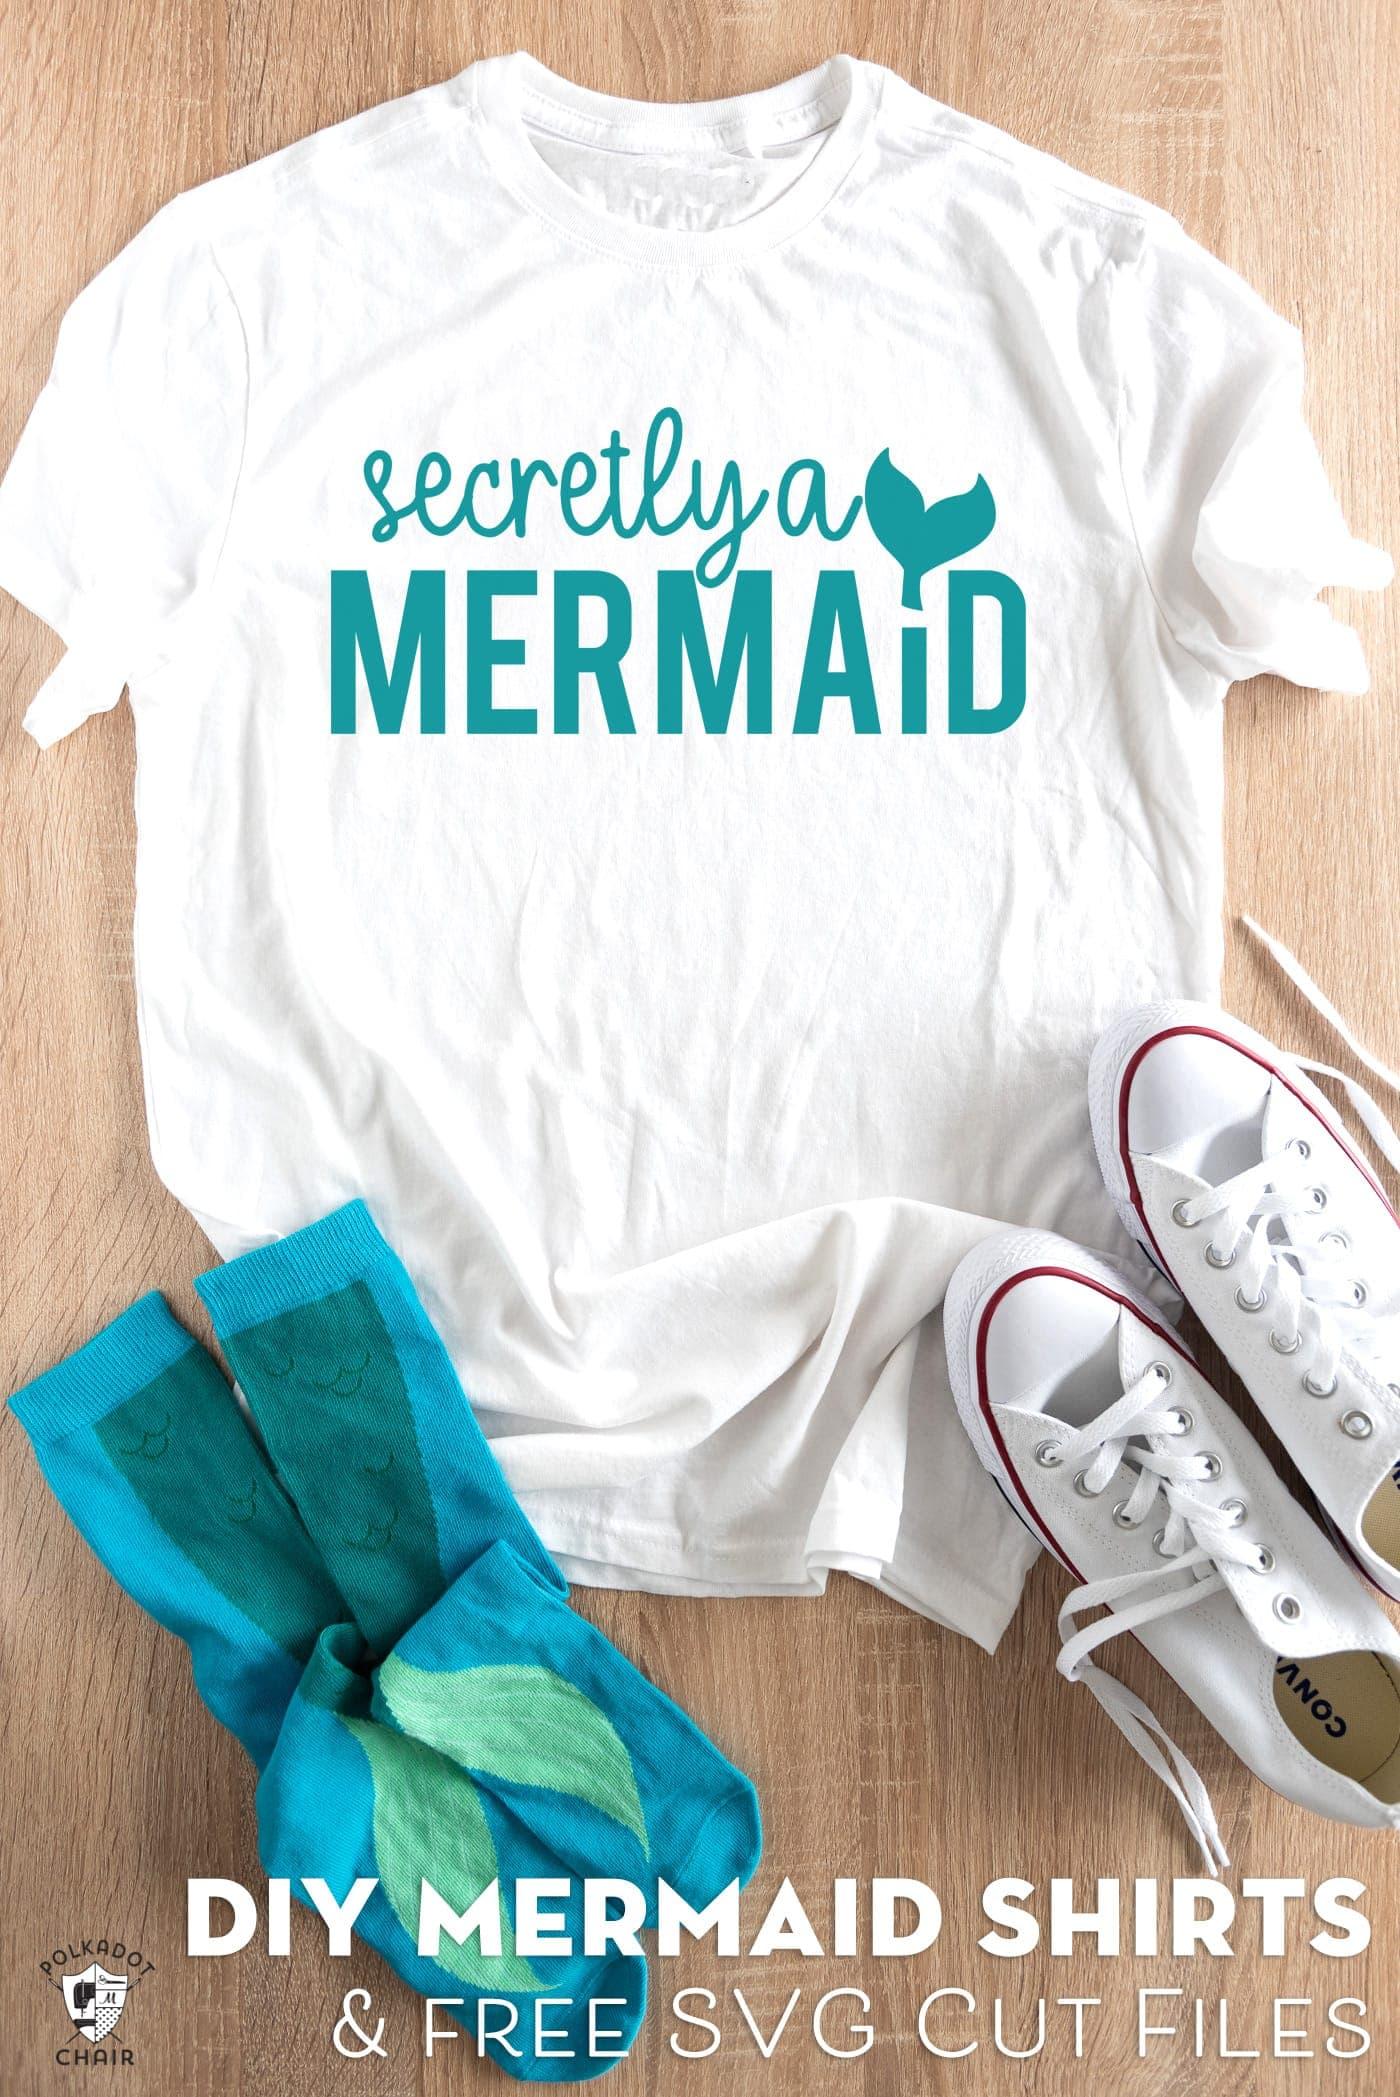 Free Mermaid Svg File : mermaid, Mermaid, Files, Cricut, Machines, Polka, Chair